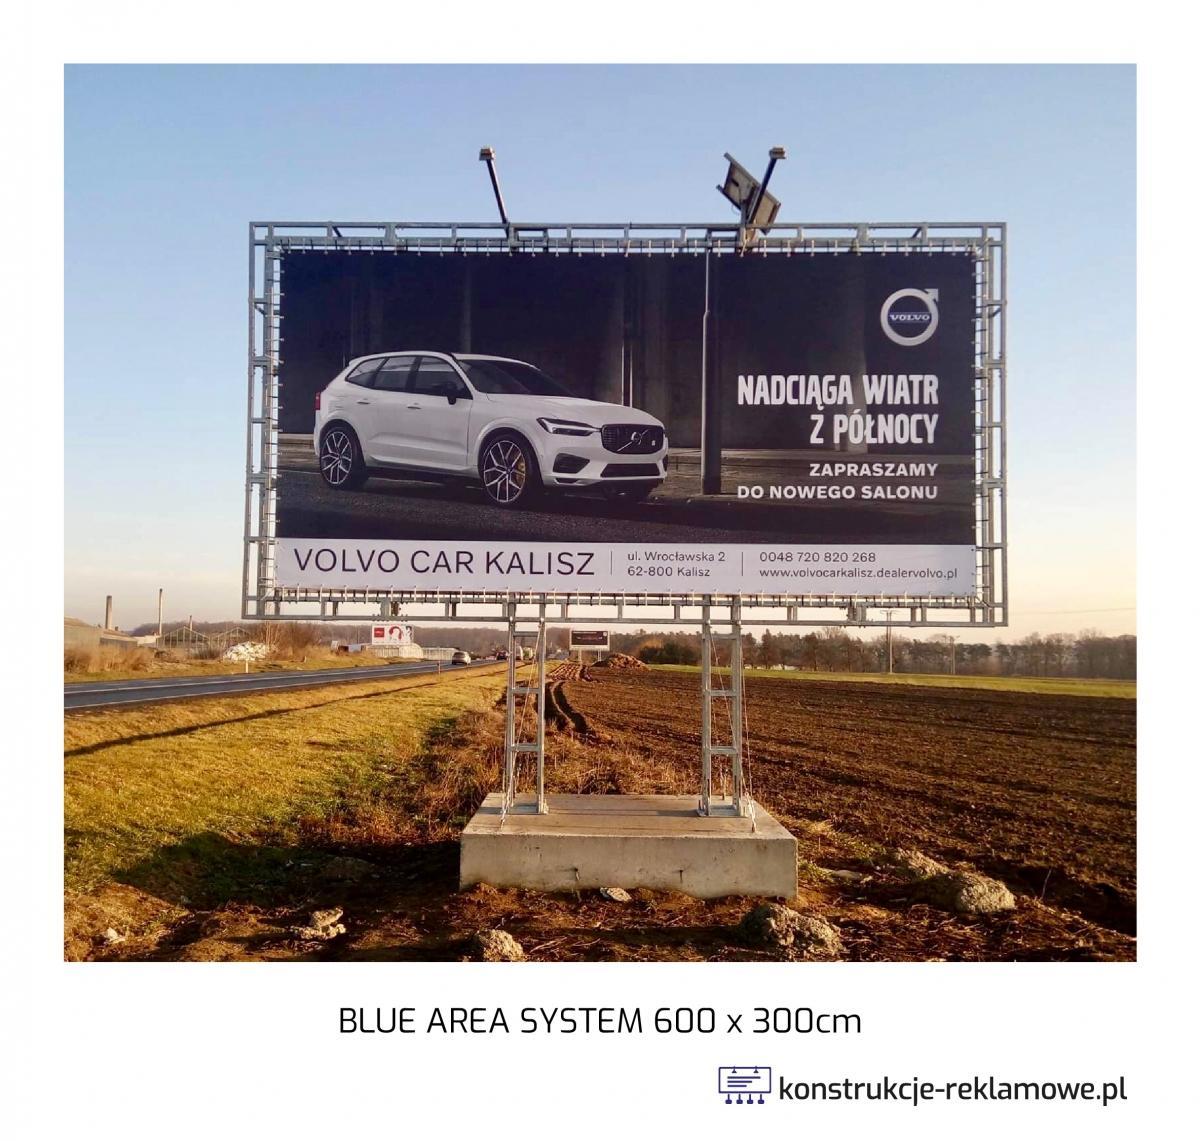 Blue area systems Obszar roboczy 1 kopia 74